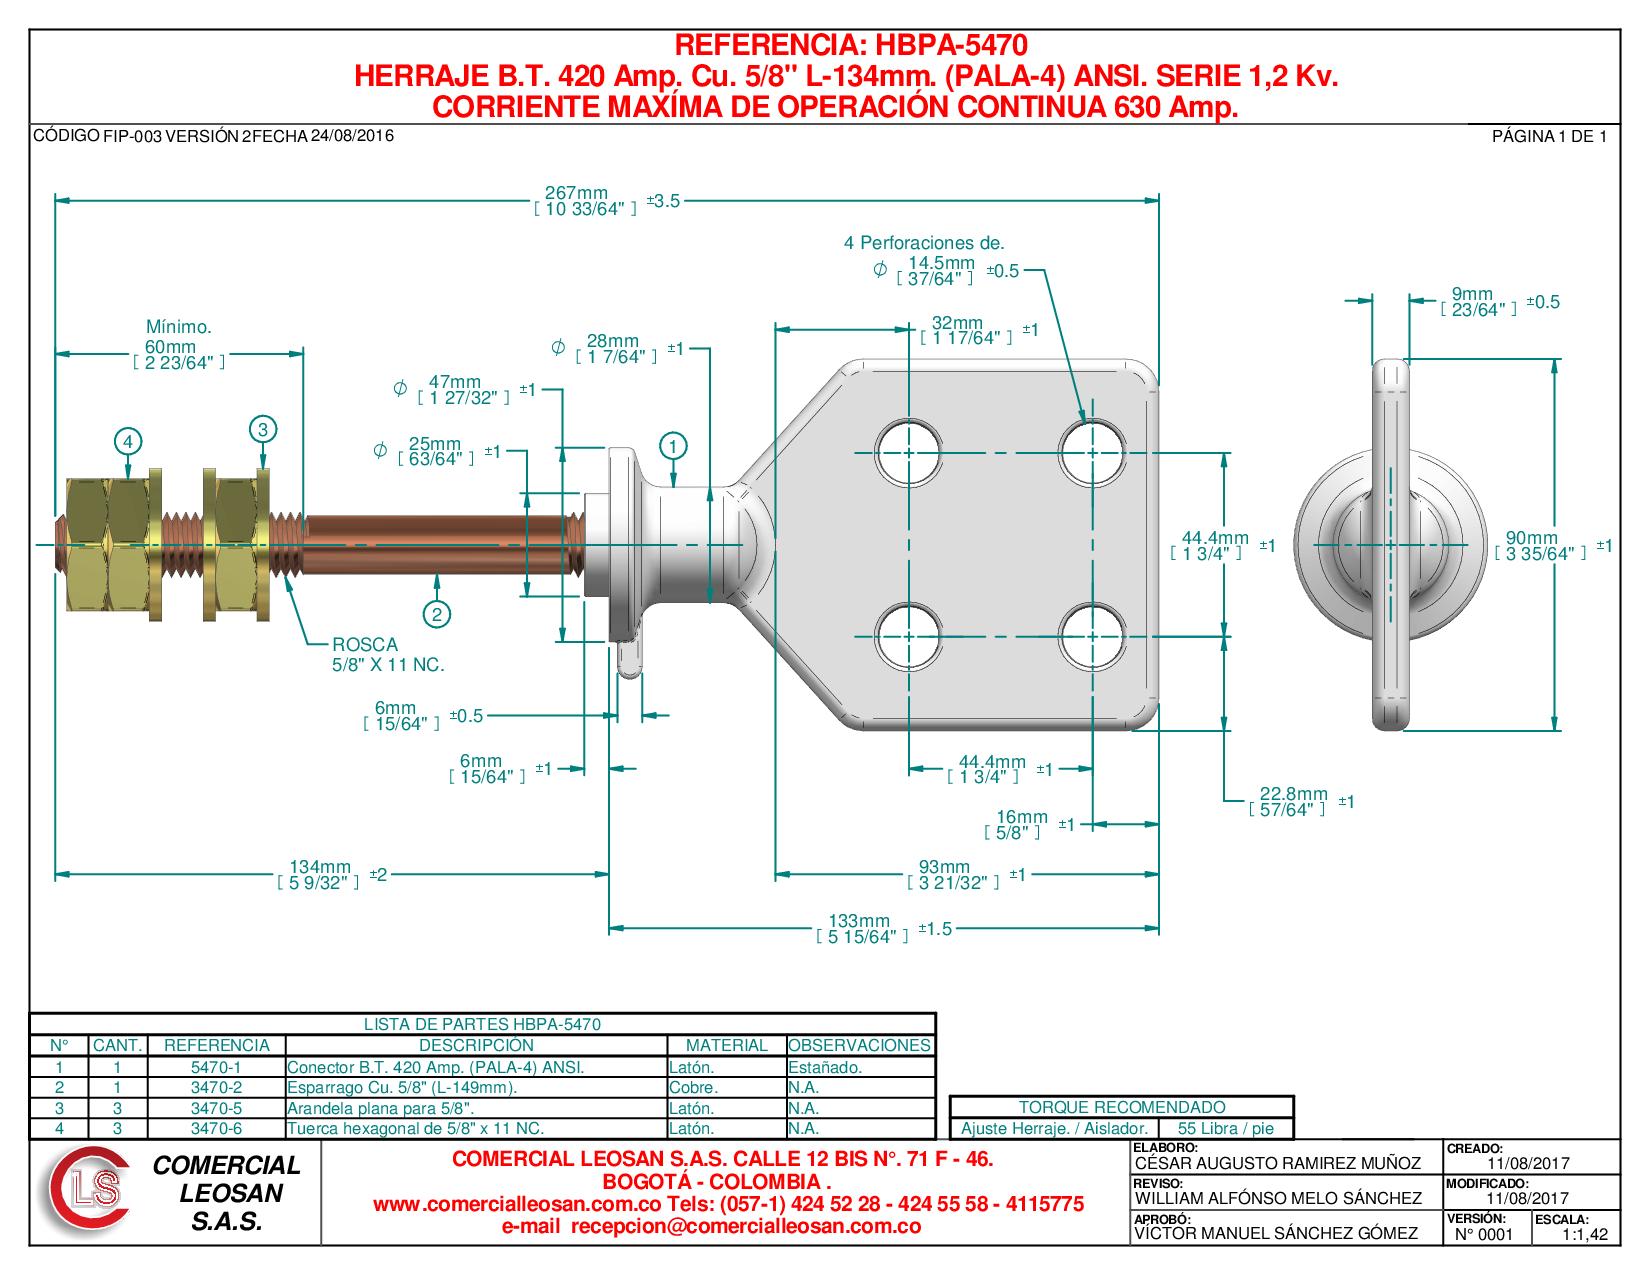 "HERRAJE B.T. 420 Amp. Cu. 5/8"" L-134mm. (PALA-4) ANSI. SERIE 1,2 Kv."